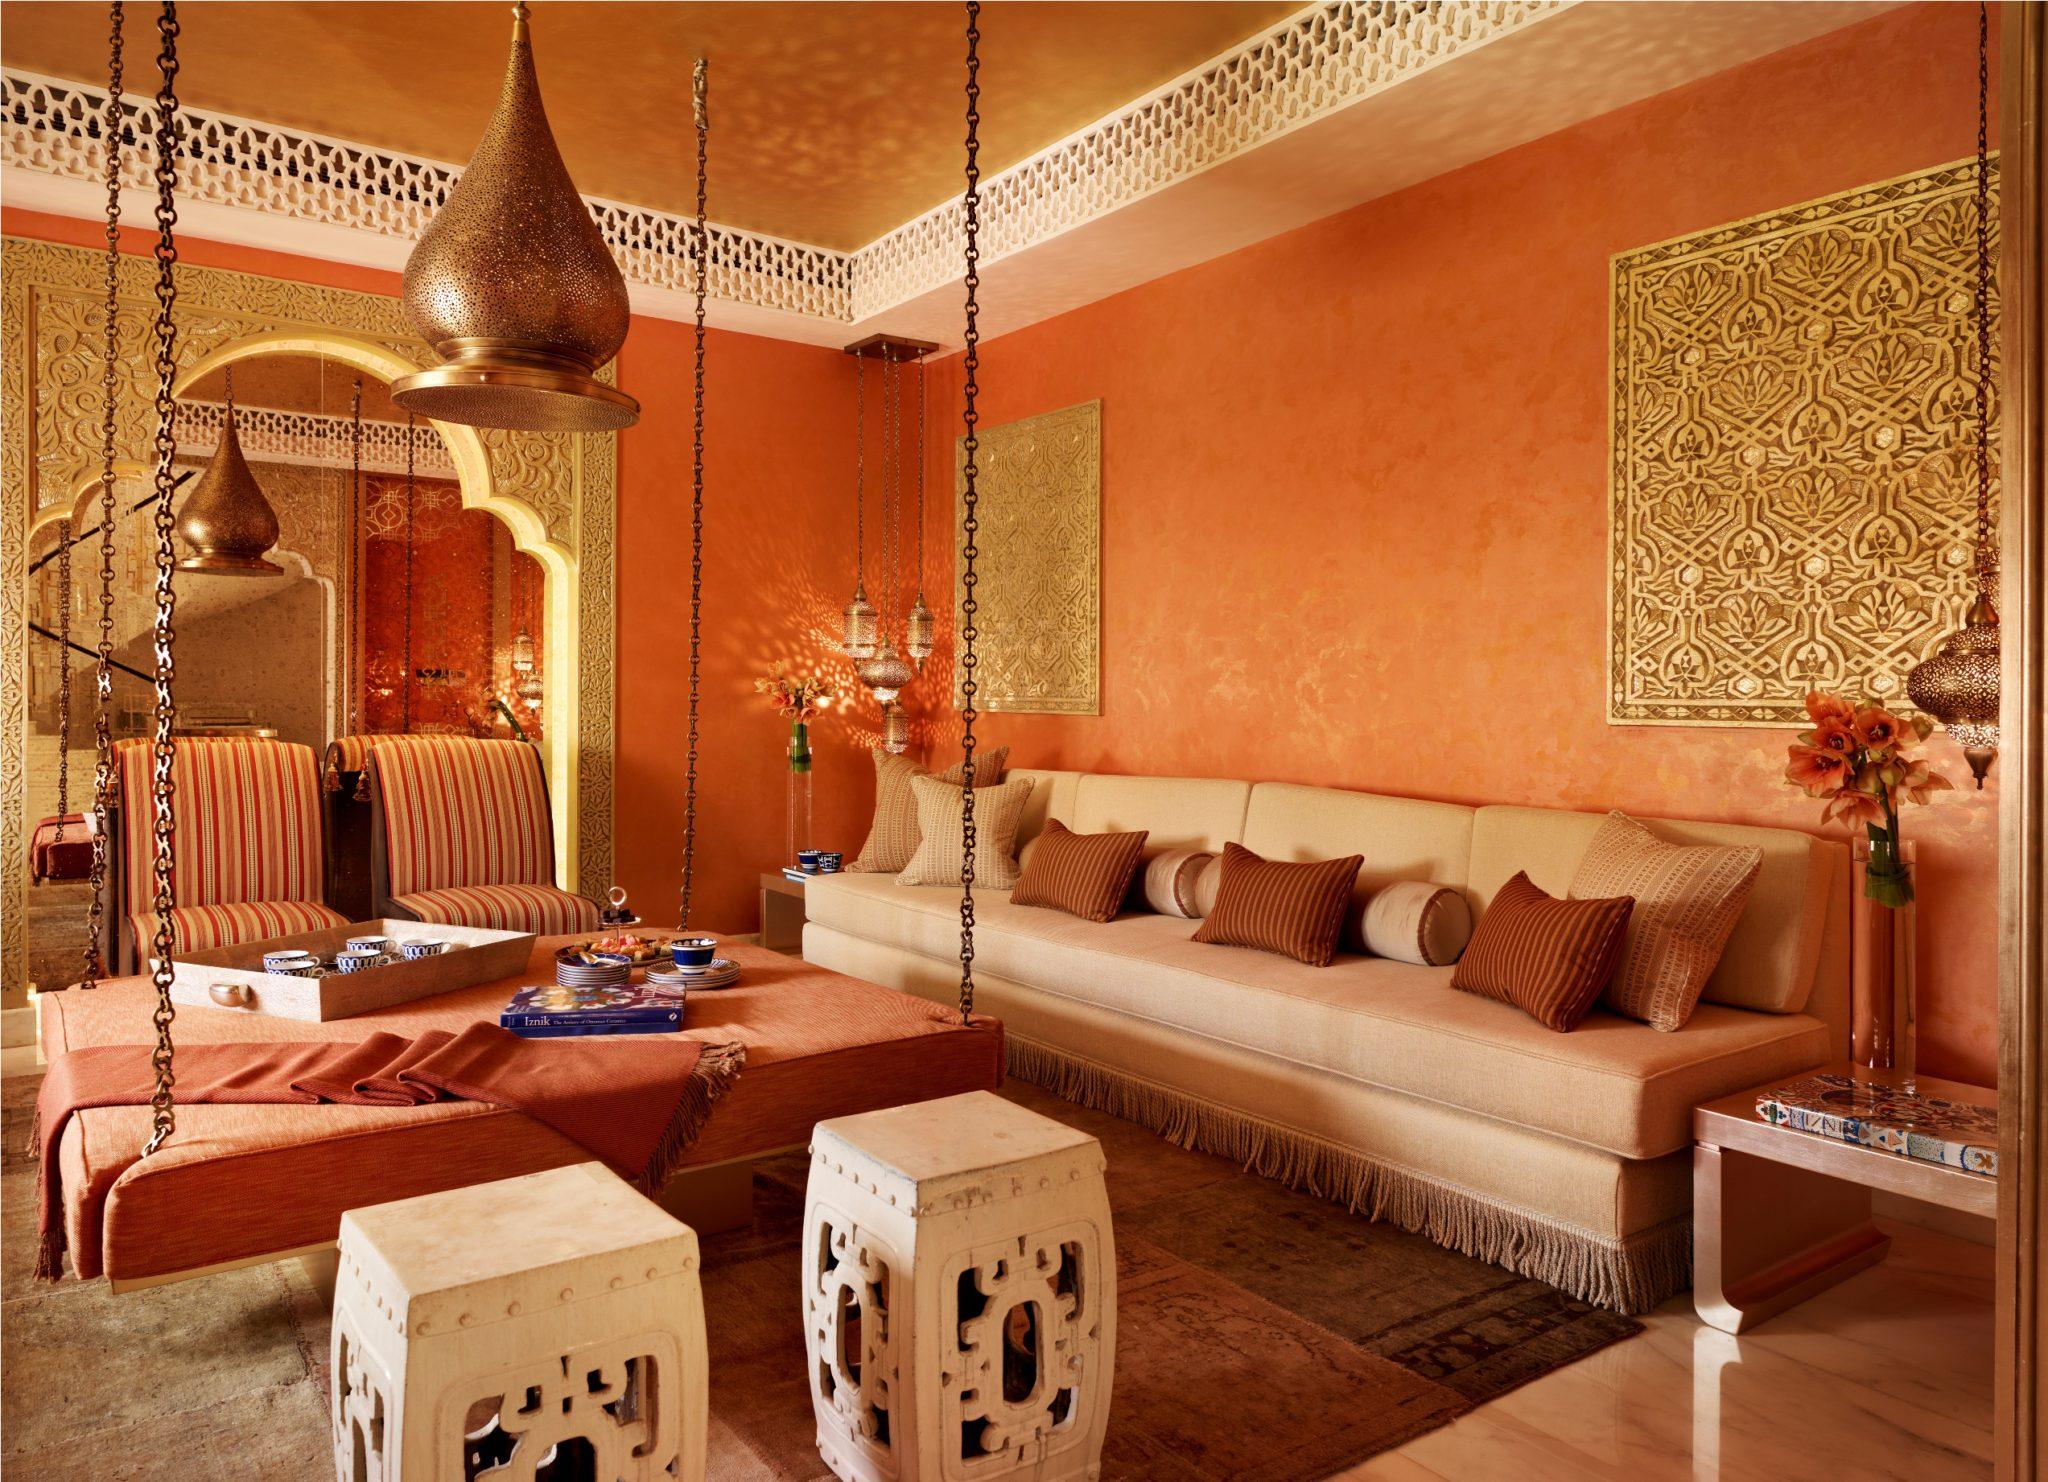 Qatar private villa - Moroccan room by Katharine Pooley